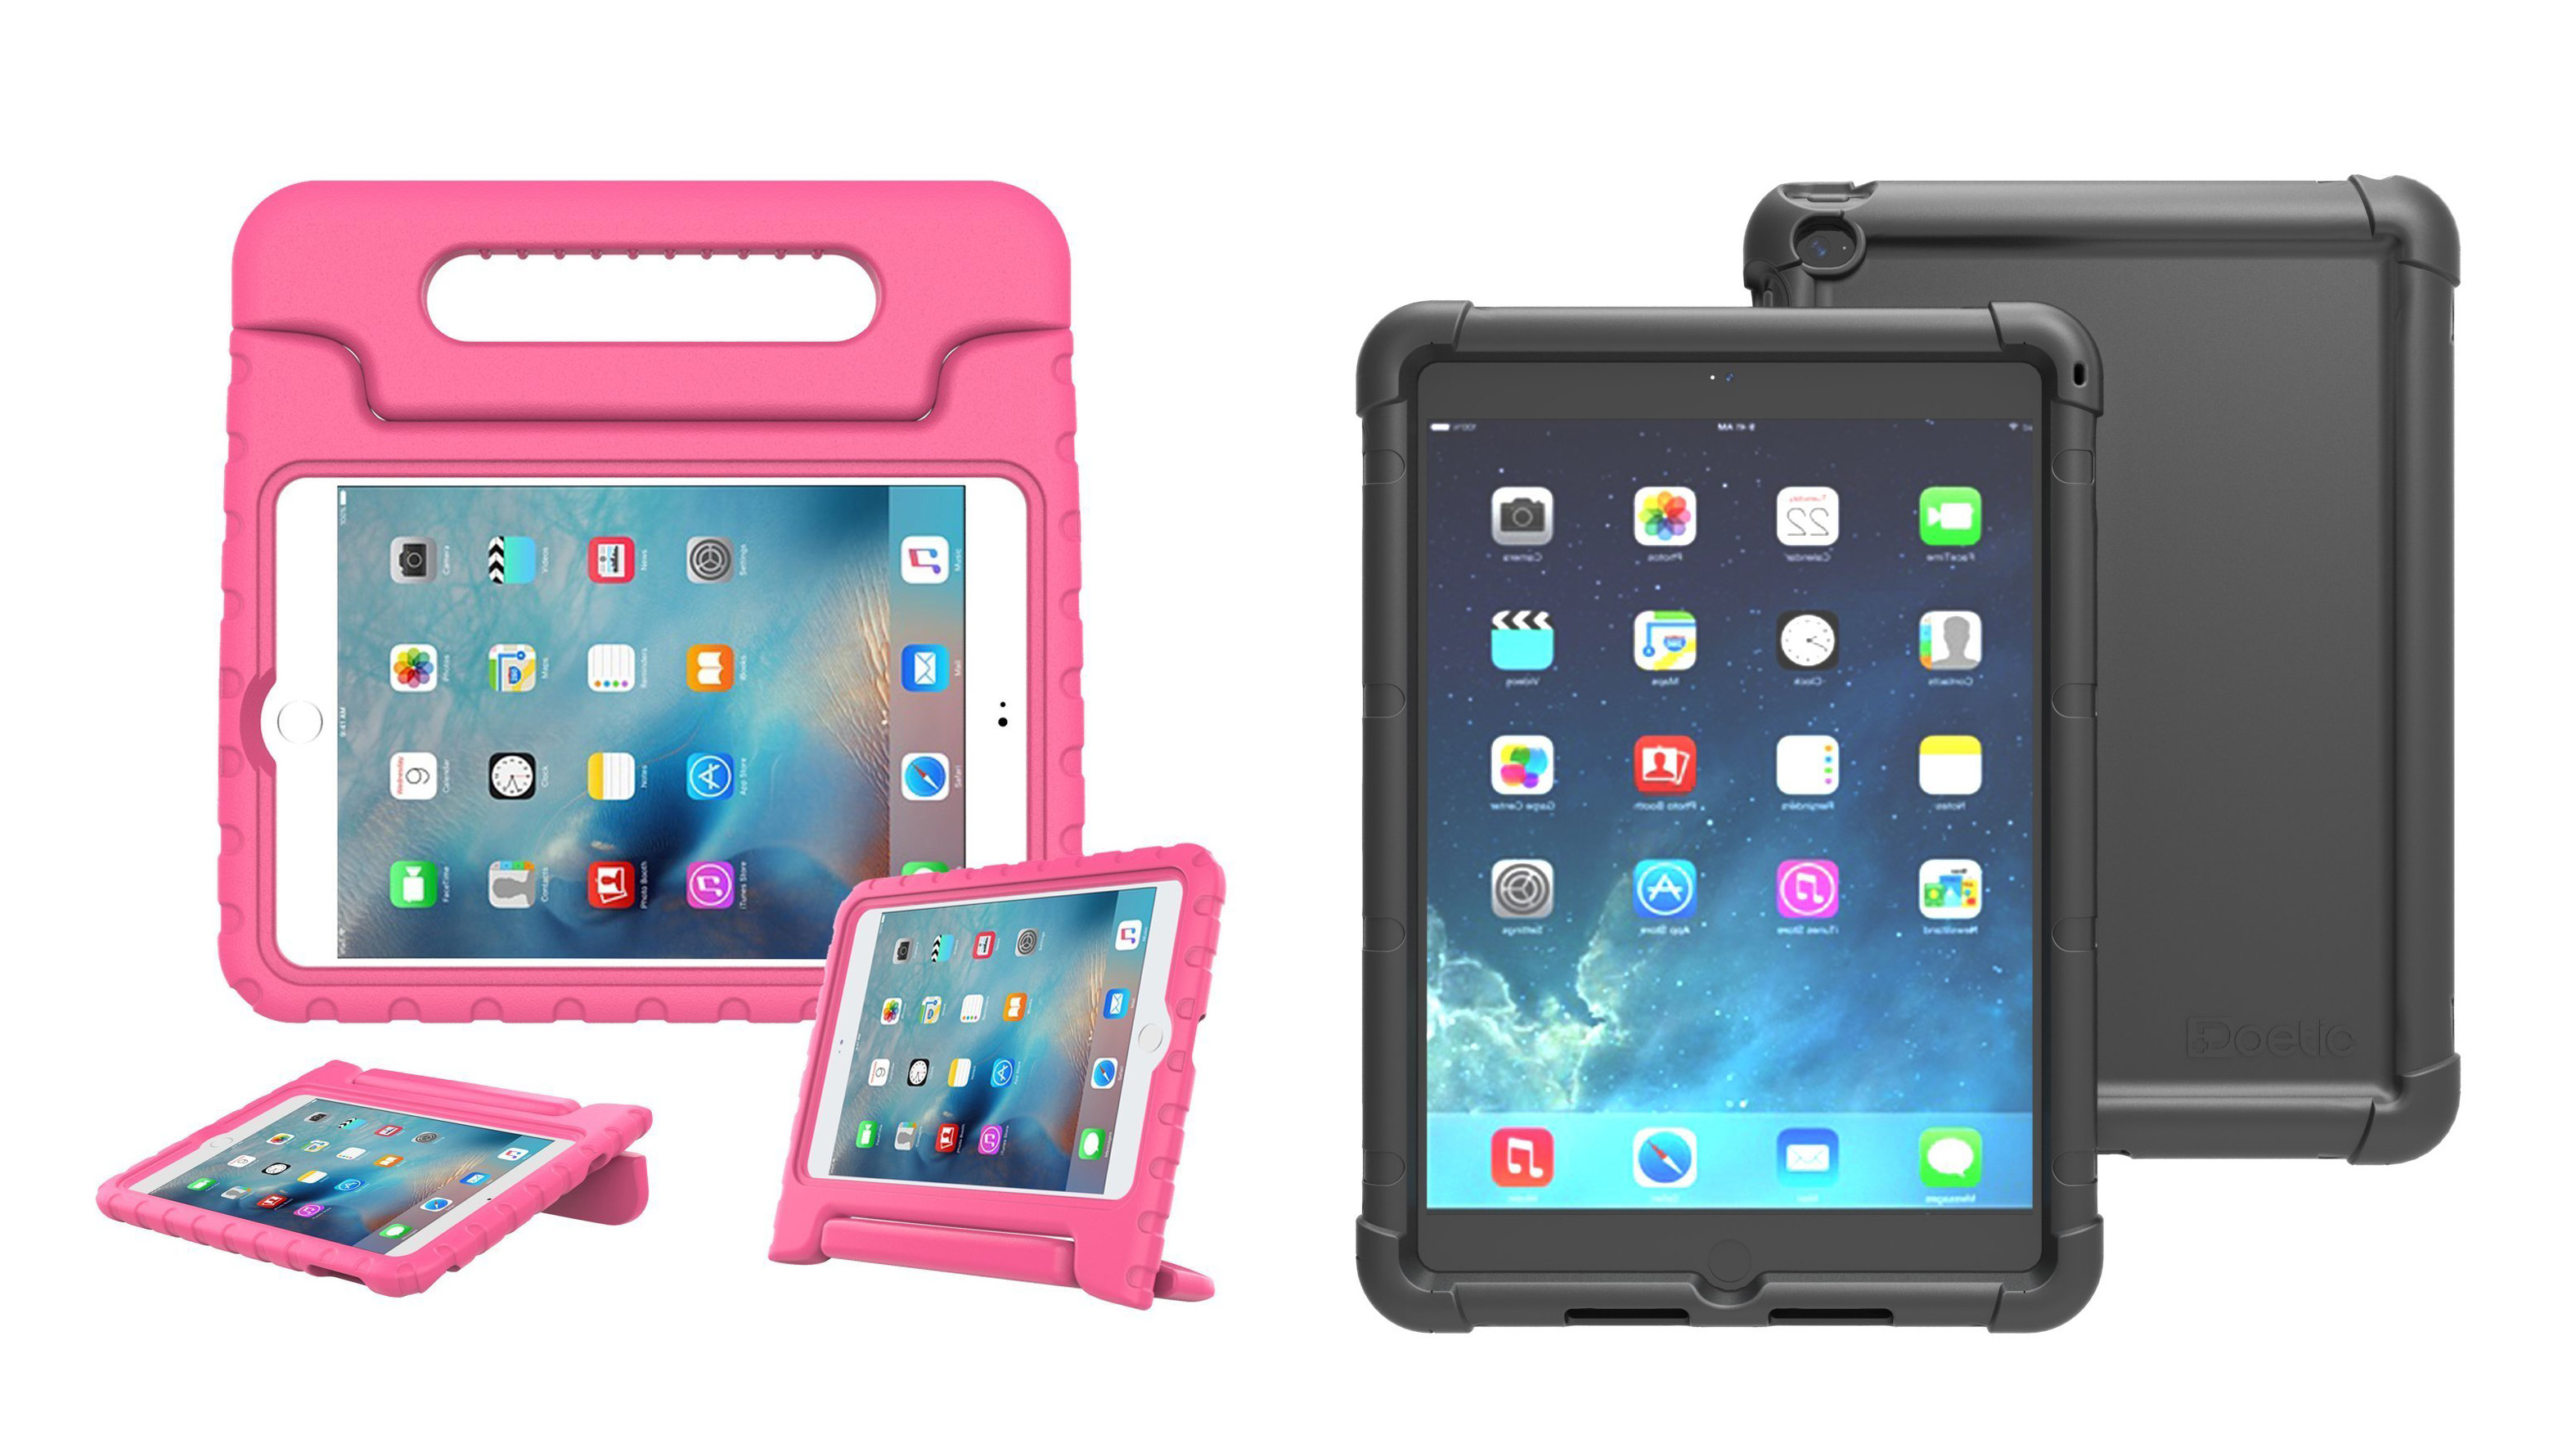 iPad Mini 4 Cases, best iPad Mini 4 Cases, new iPad Mini 4 Cases, new iPad cases, iPad Mini 4 Case, iPad Mini 4 Cover, iPad mini accessories, iPad mini cases